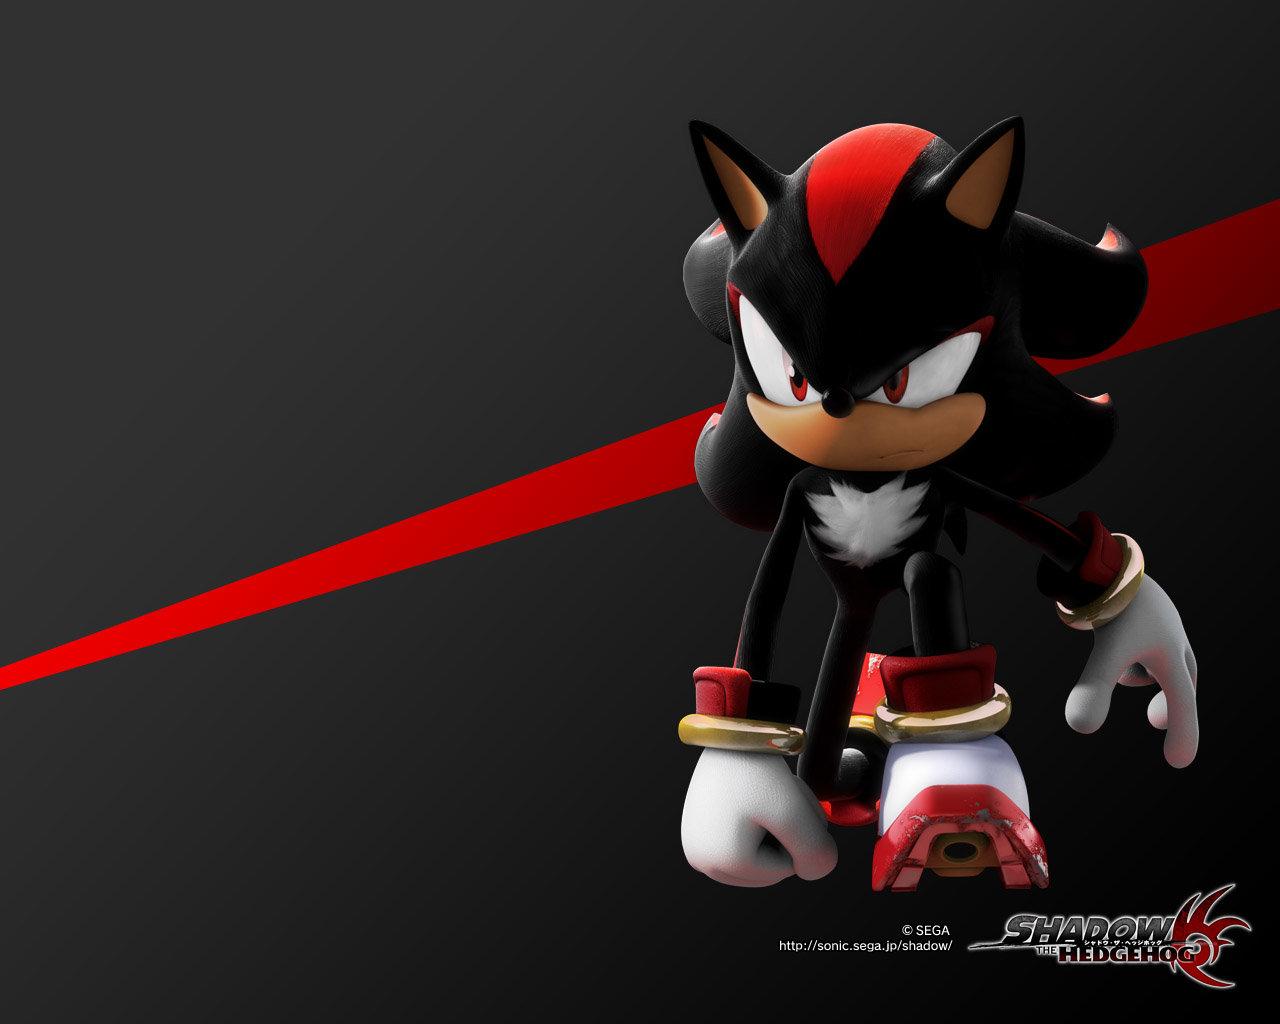 Shadow The Hedgehog wallpapers HD for desktop backgrounds